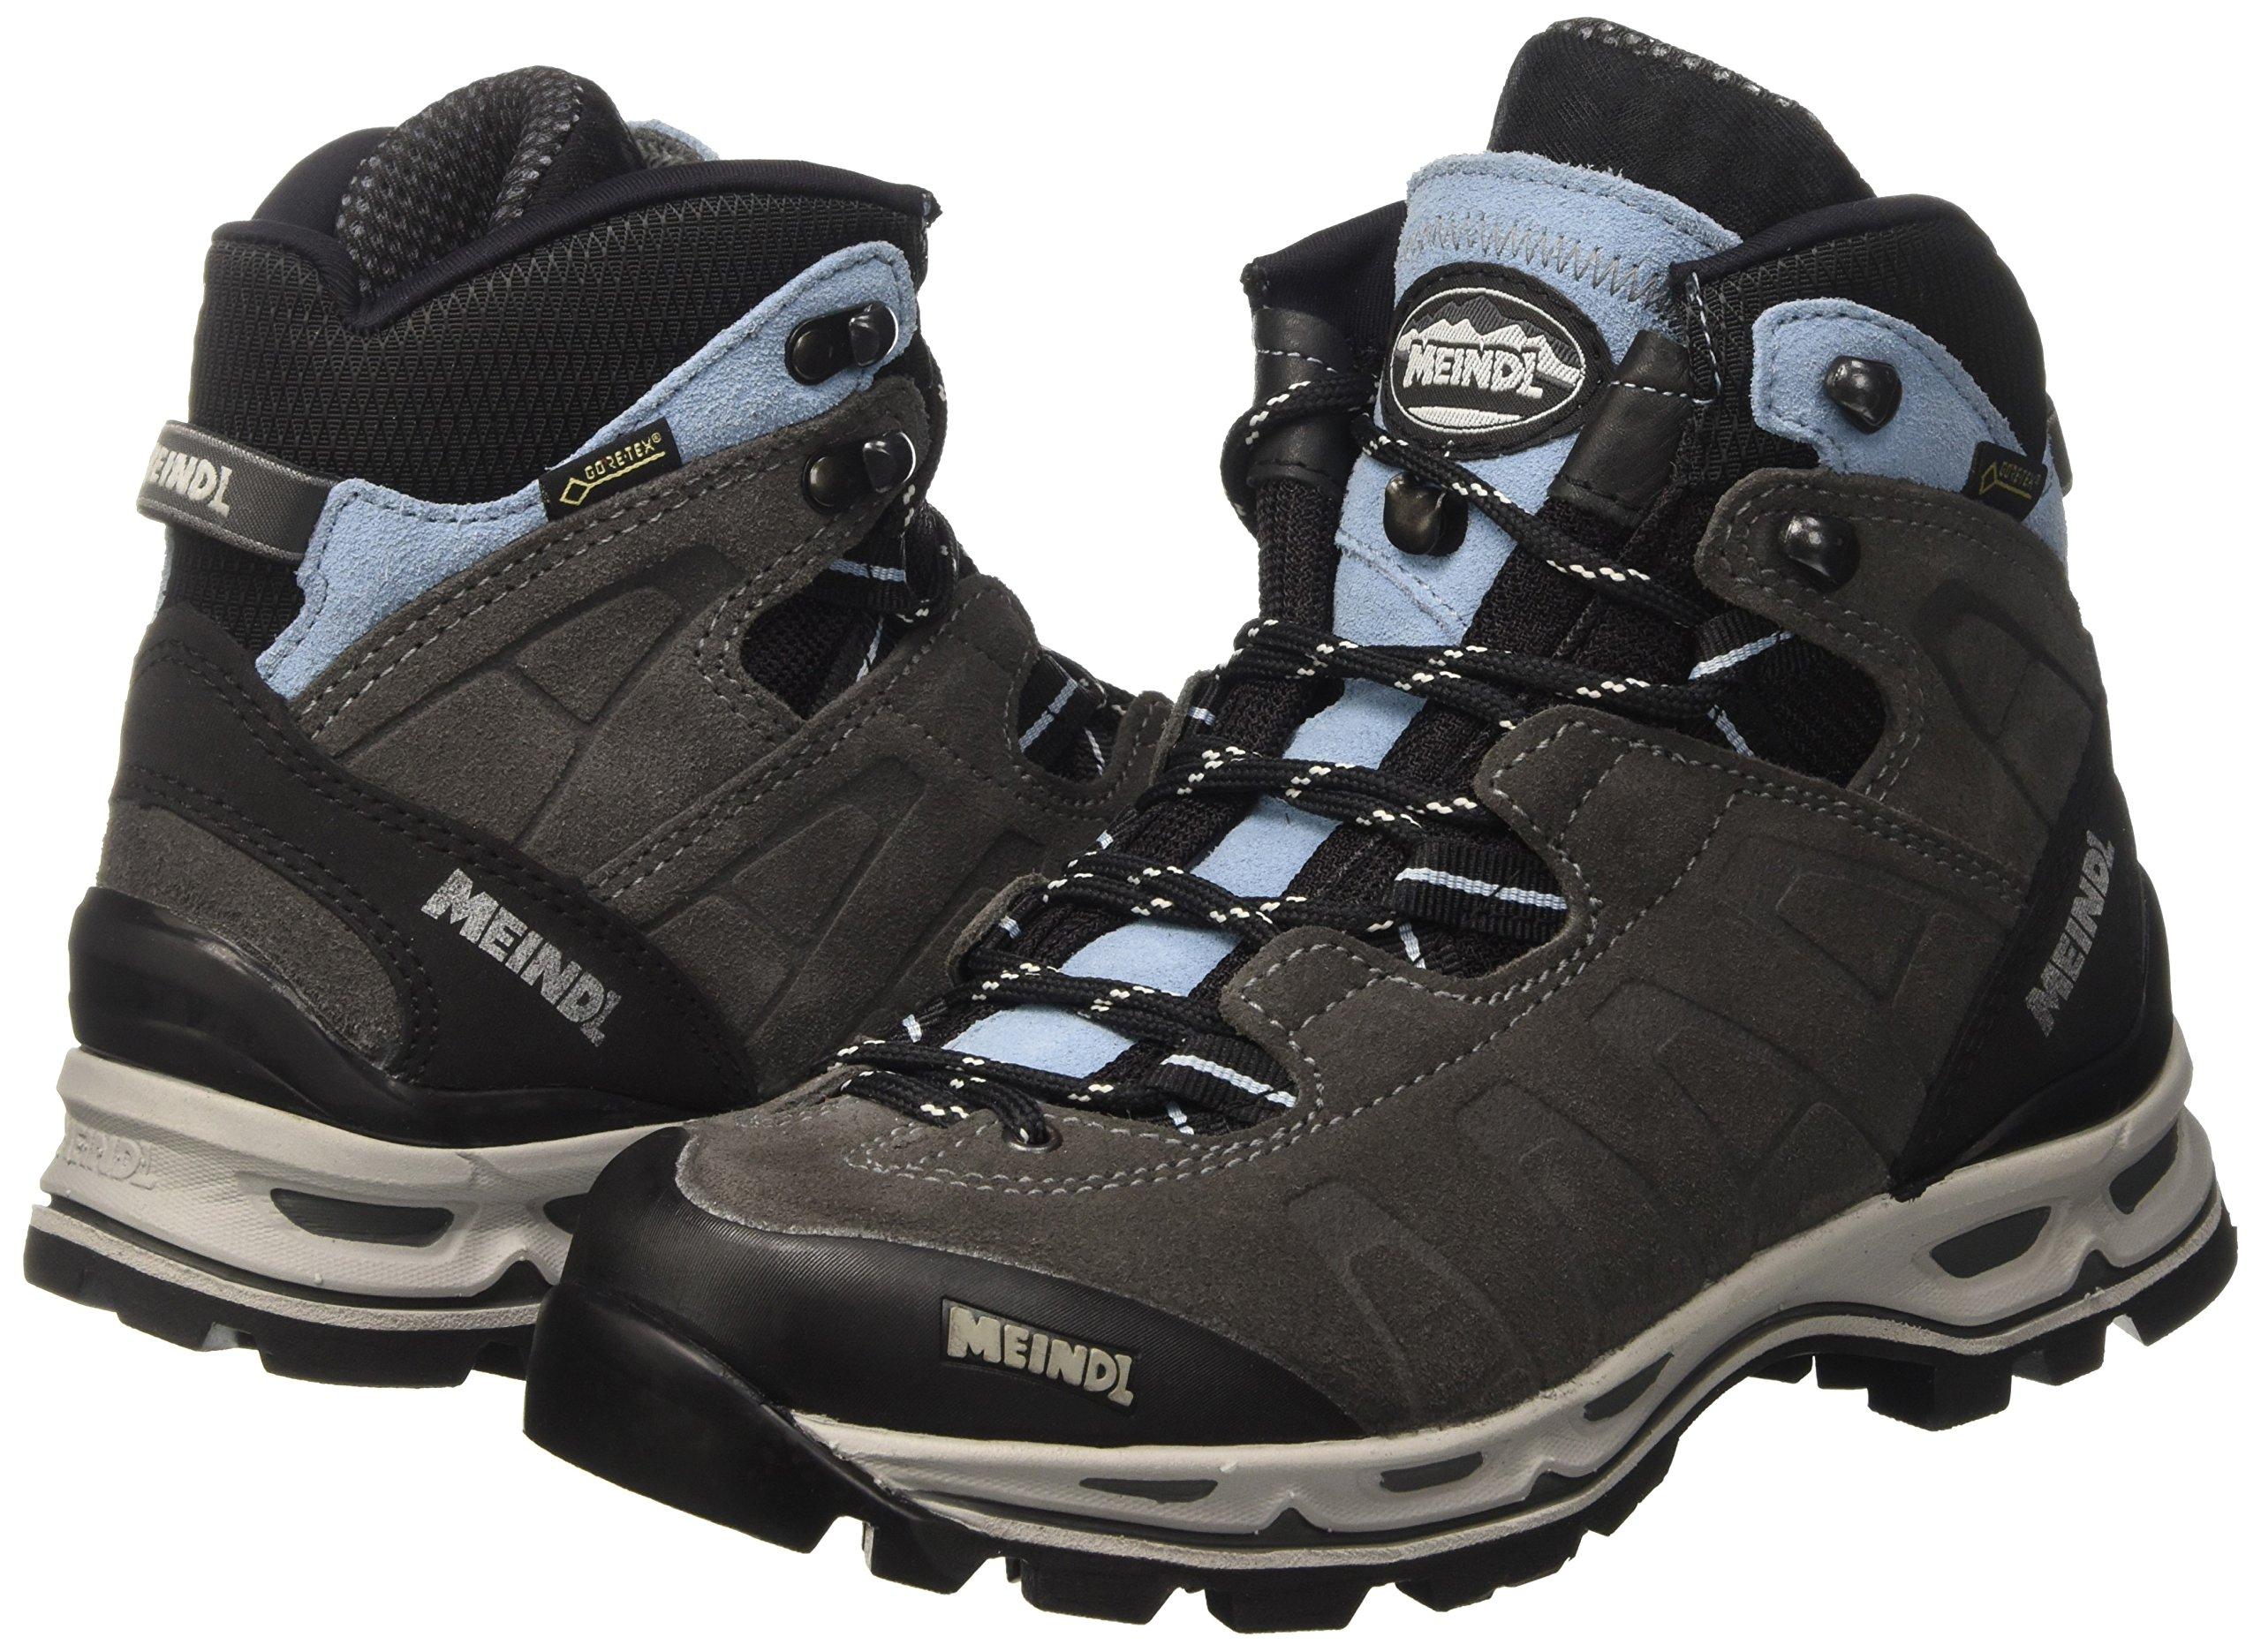 Meindl Air Revolution Men/'s Hiking Shoes Trekking Shoes Shoes Lace Up Shoes New